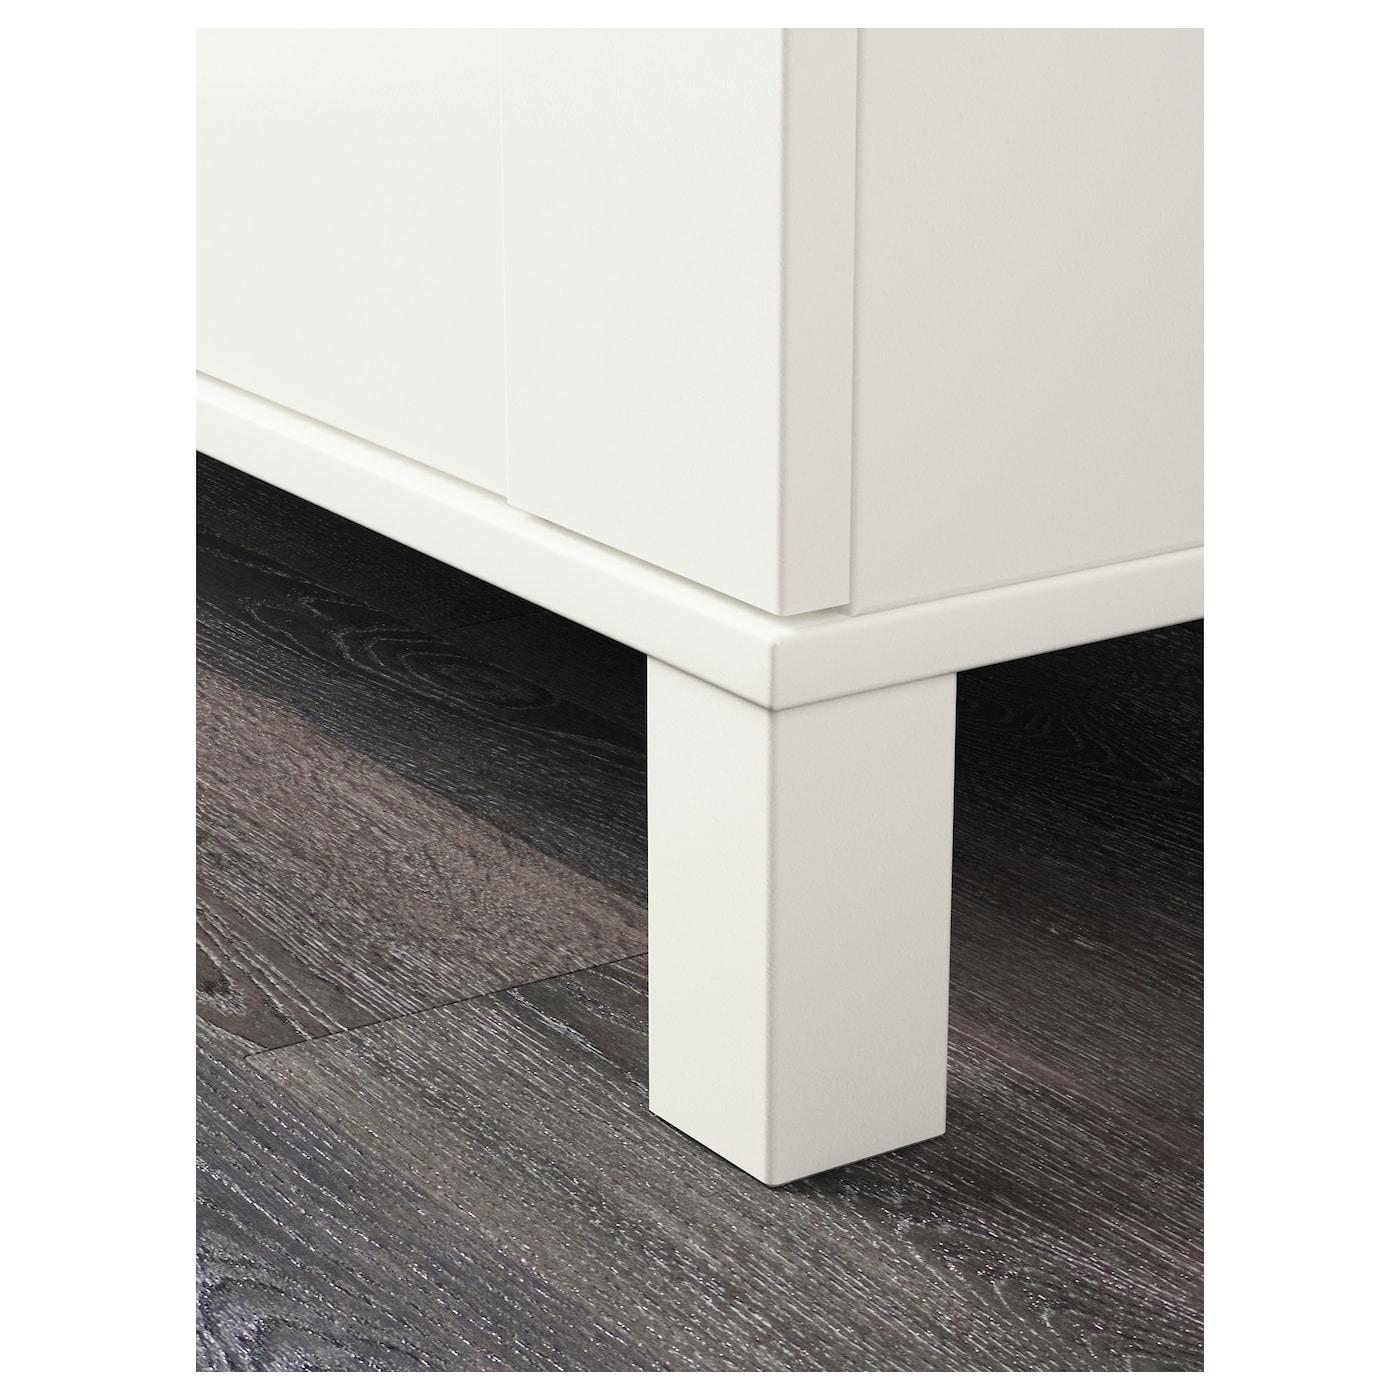 ANEBODA Wardrobe White 81 x 180 cm - IKEA